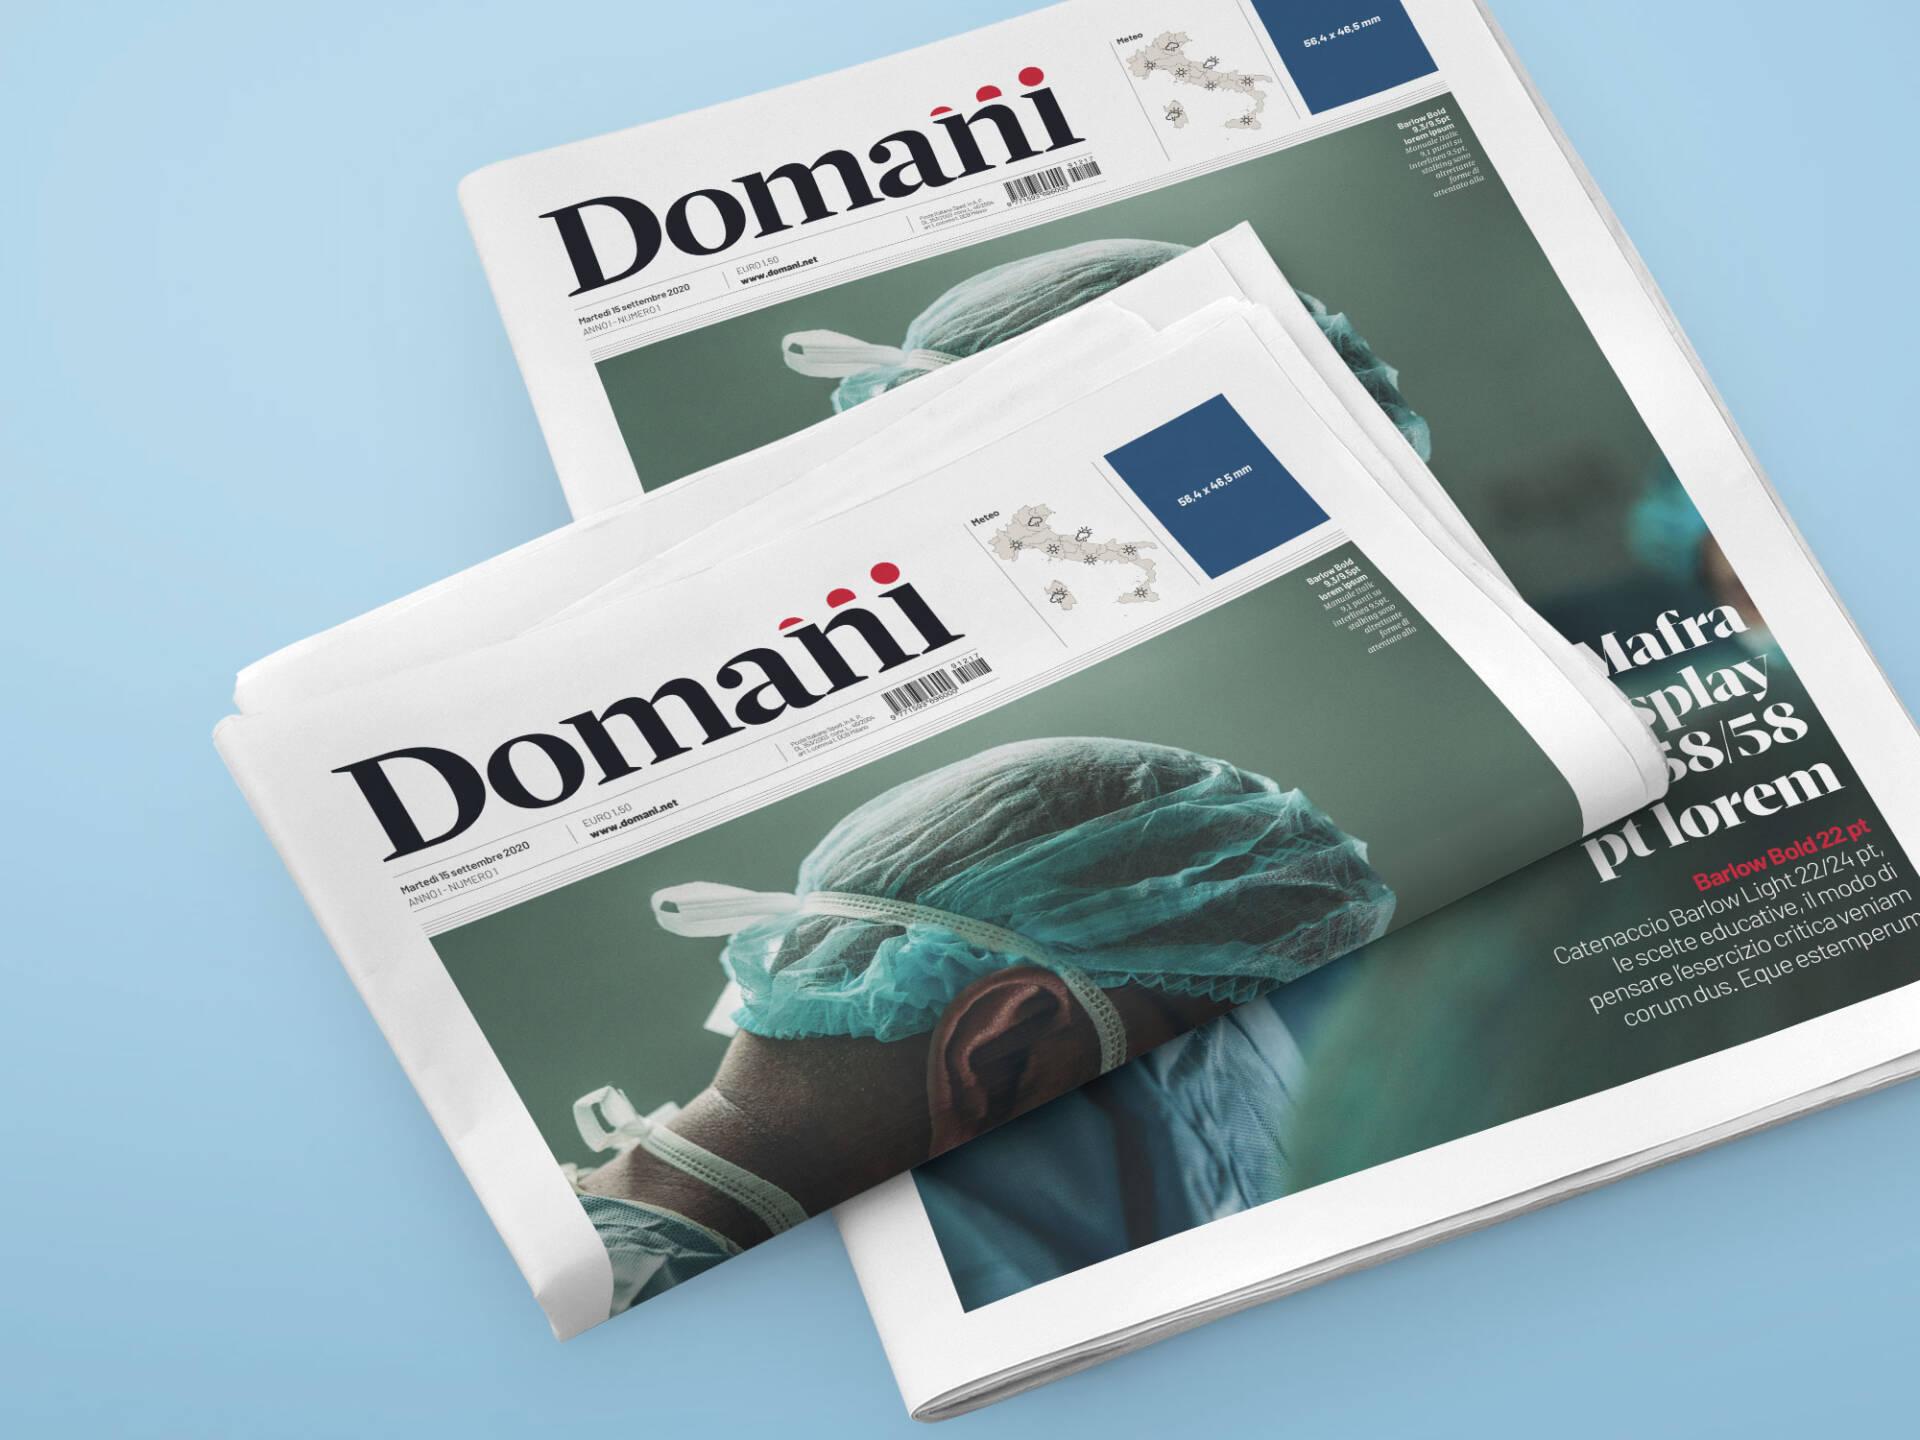 Domani_Print_Frontpage_Wenceslau_News_Design01